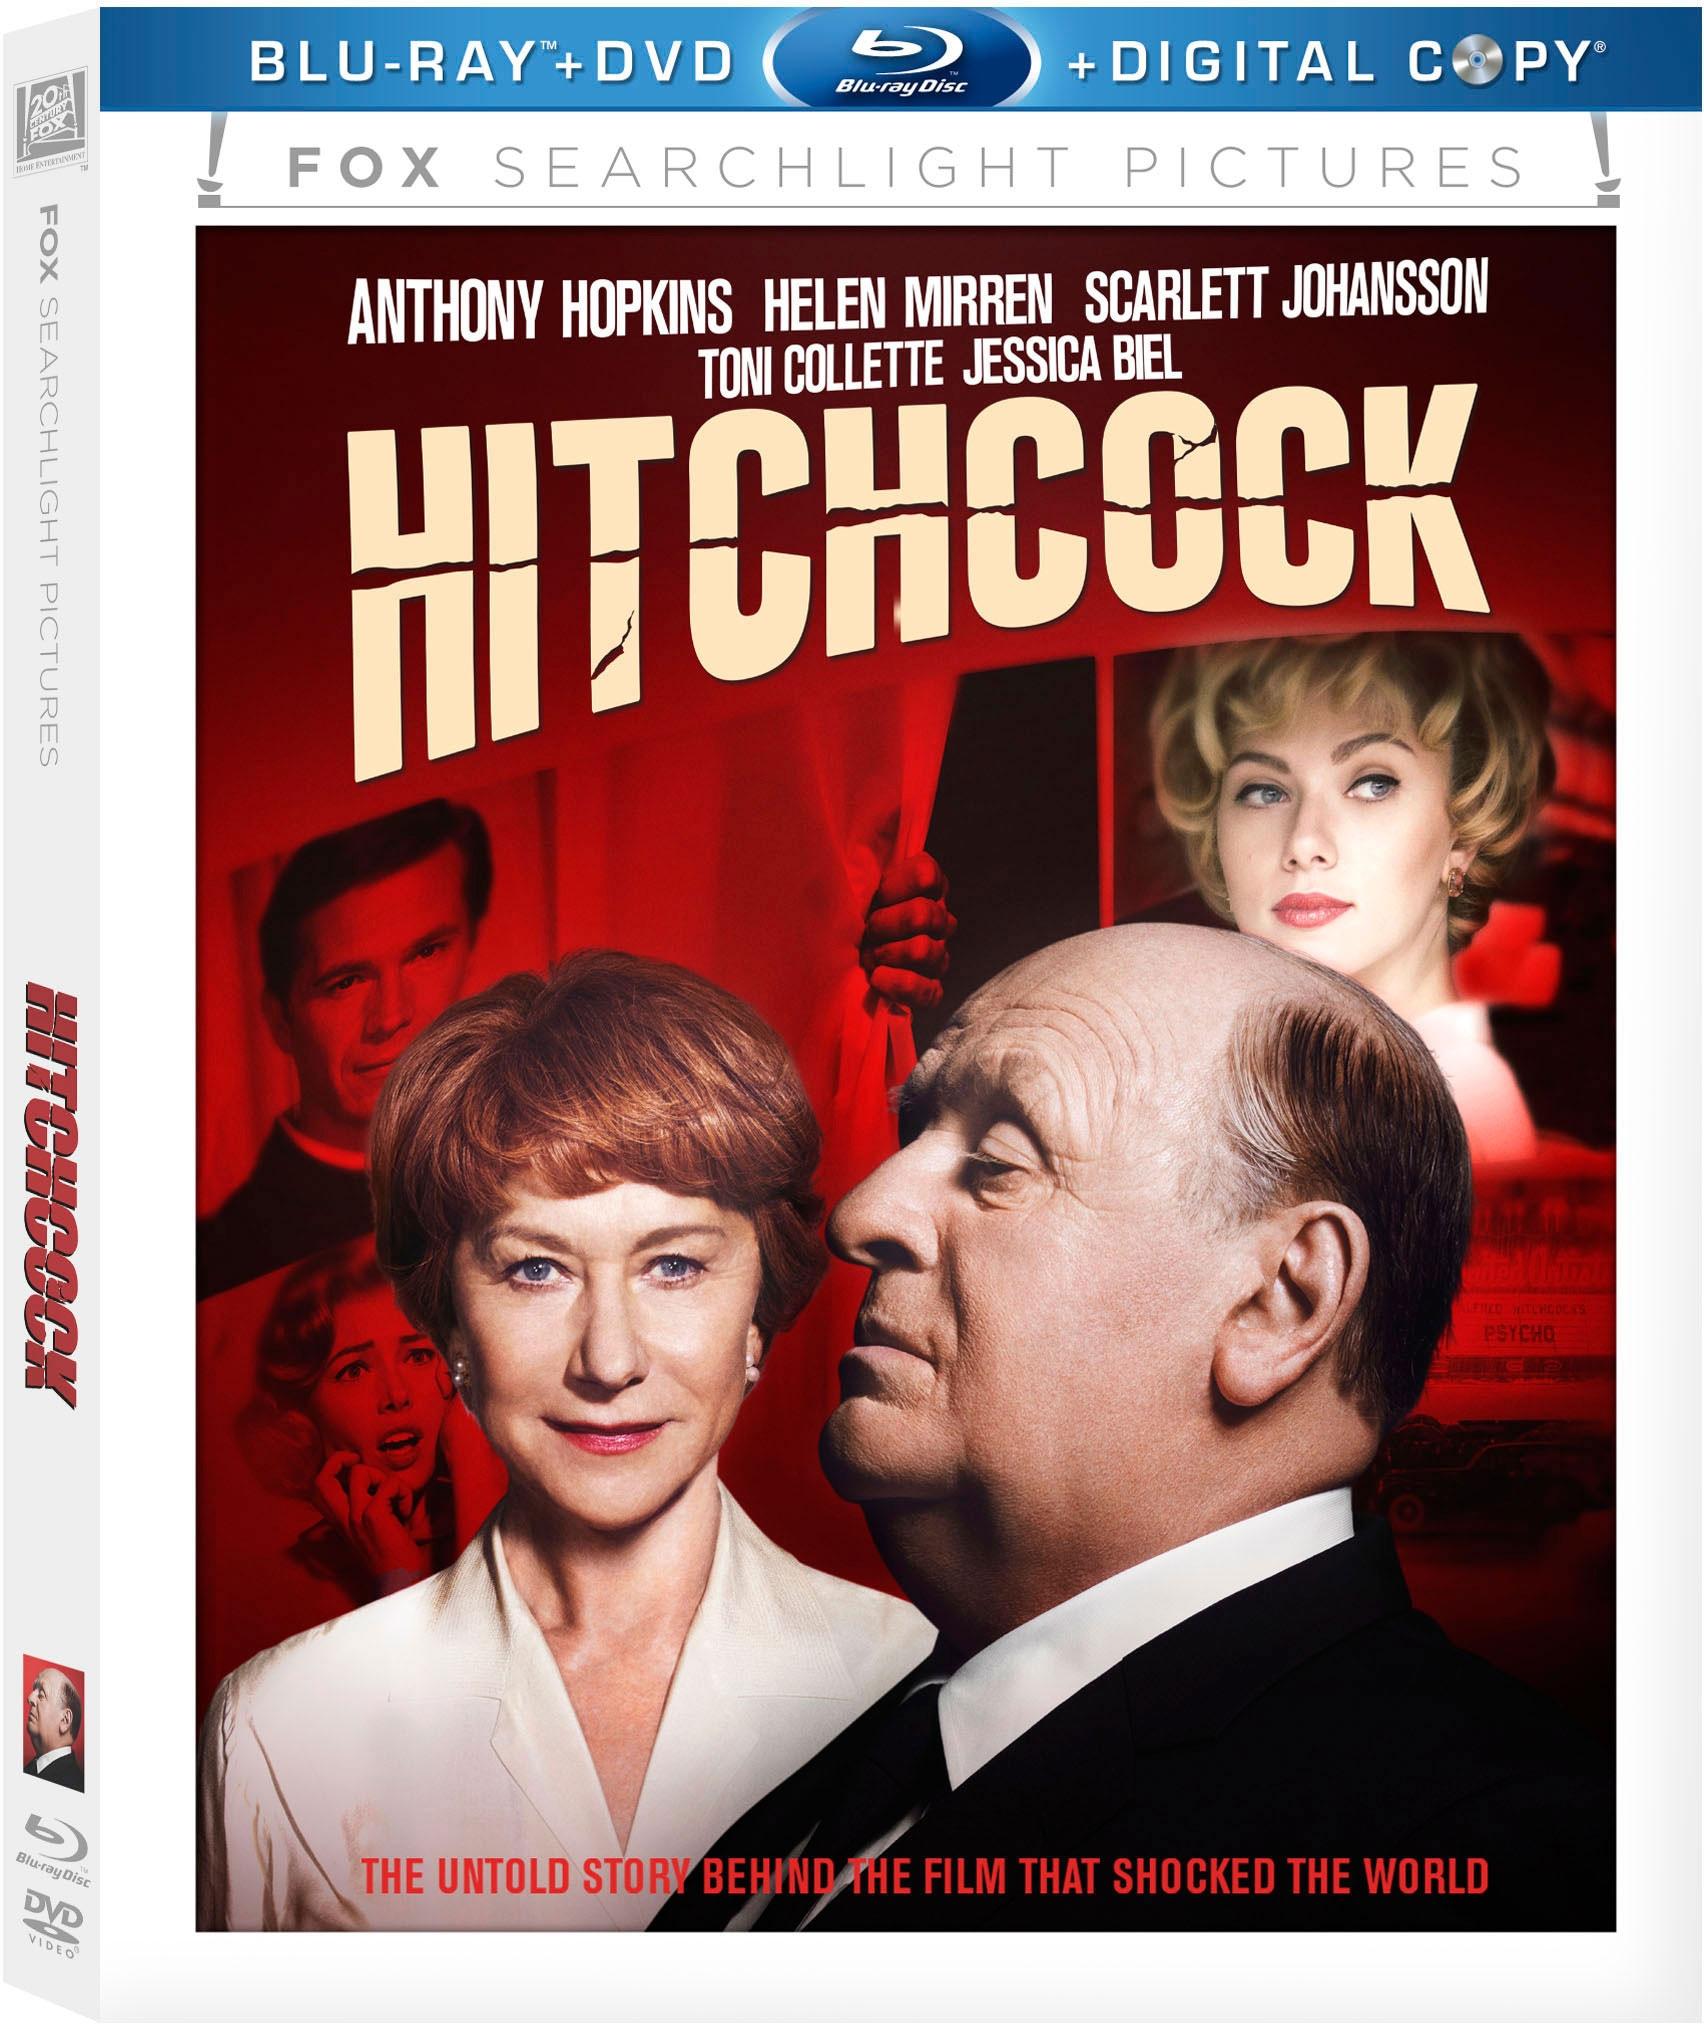 Hitchcock (Blu-ray/DVD)